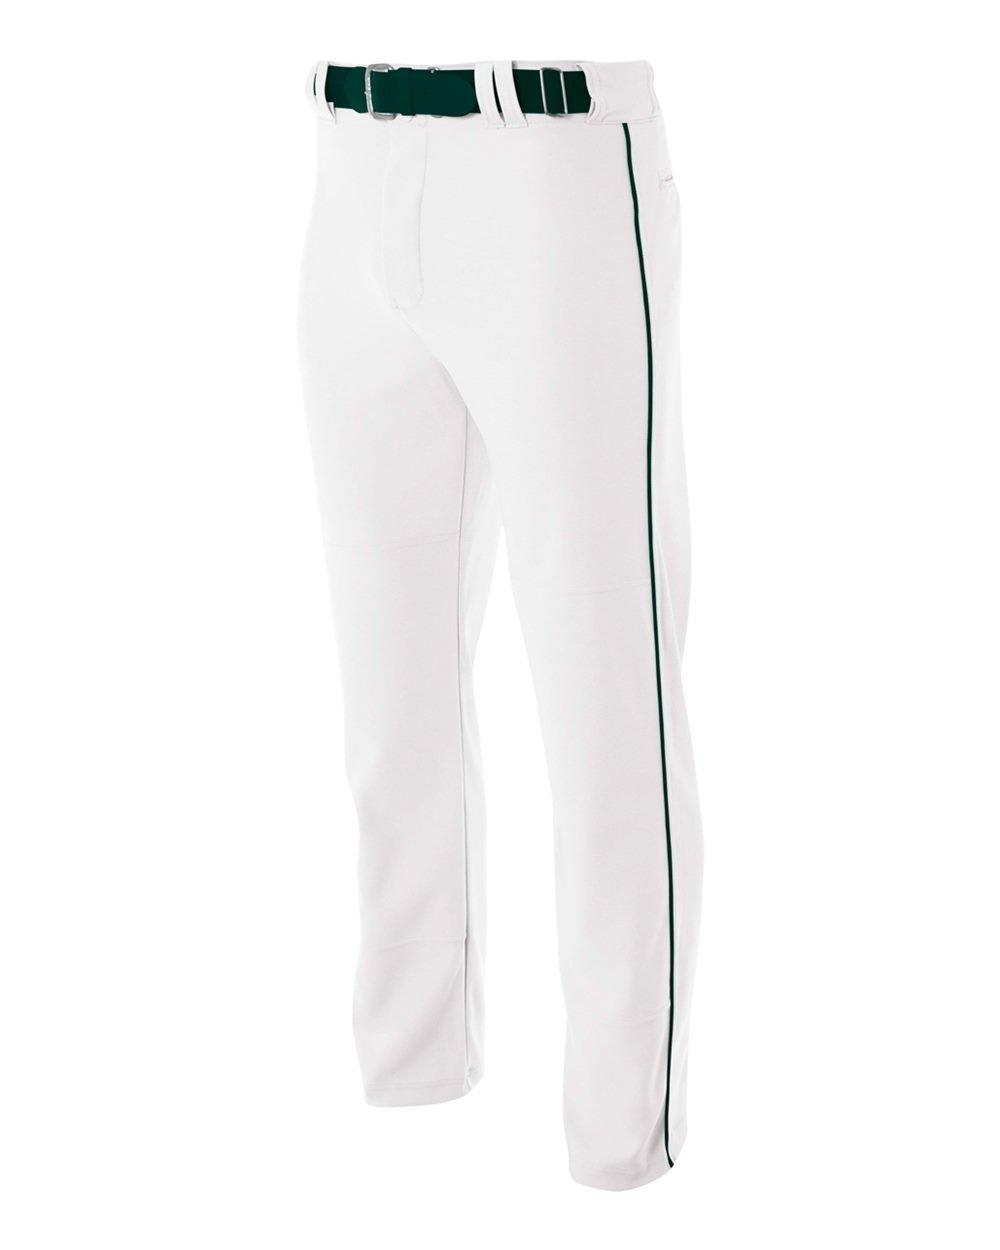 A4 NB6162-WHF Pro-Style Open Bottom Baseball Pants, Medium by A4